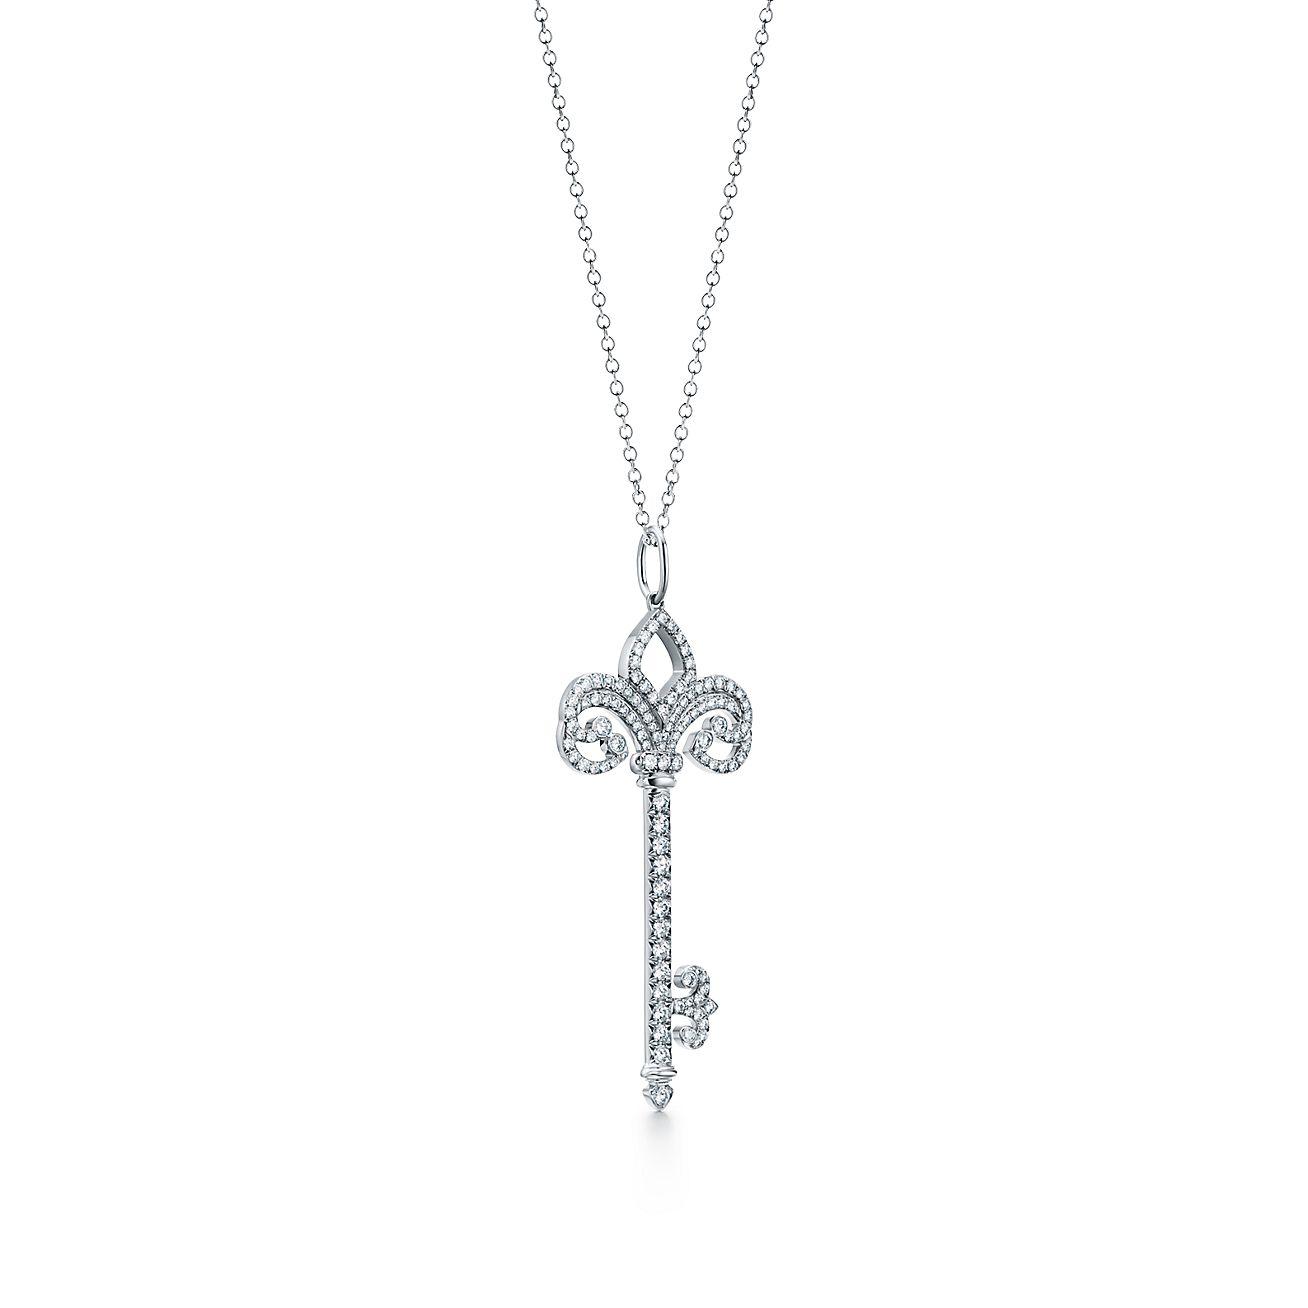 Tiffany keys fleur de lis key pendant in platinum with diamonds tiffany keysfleur de lis key pendant aloadofball Choice Image